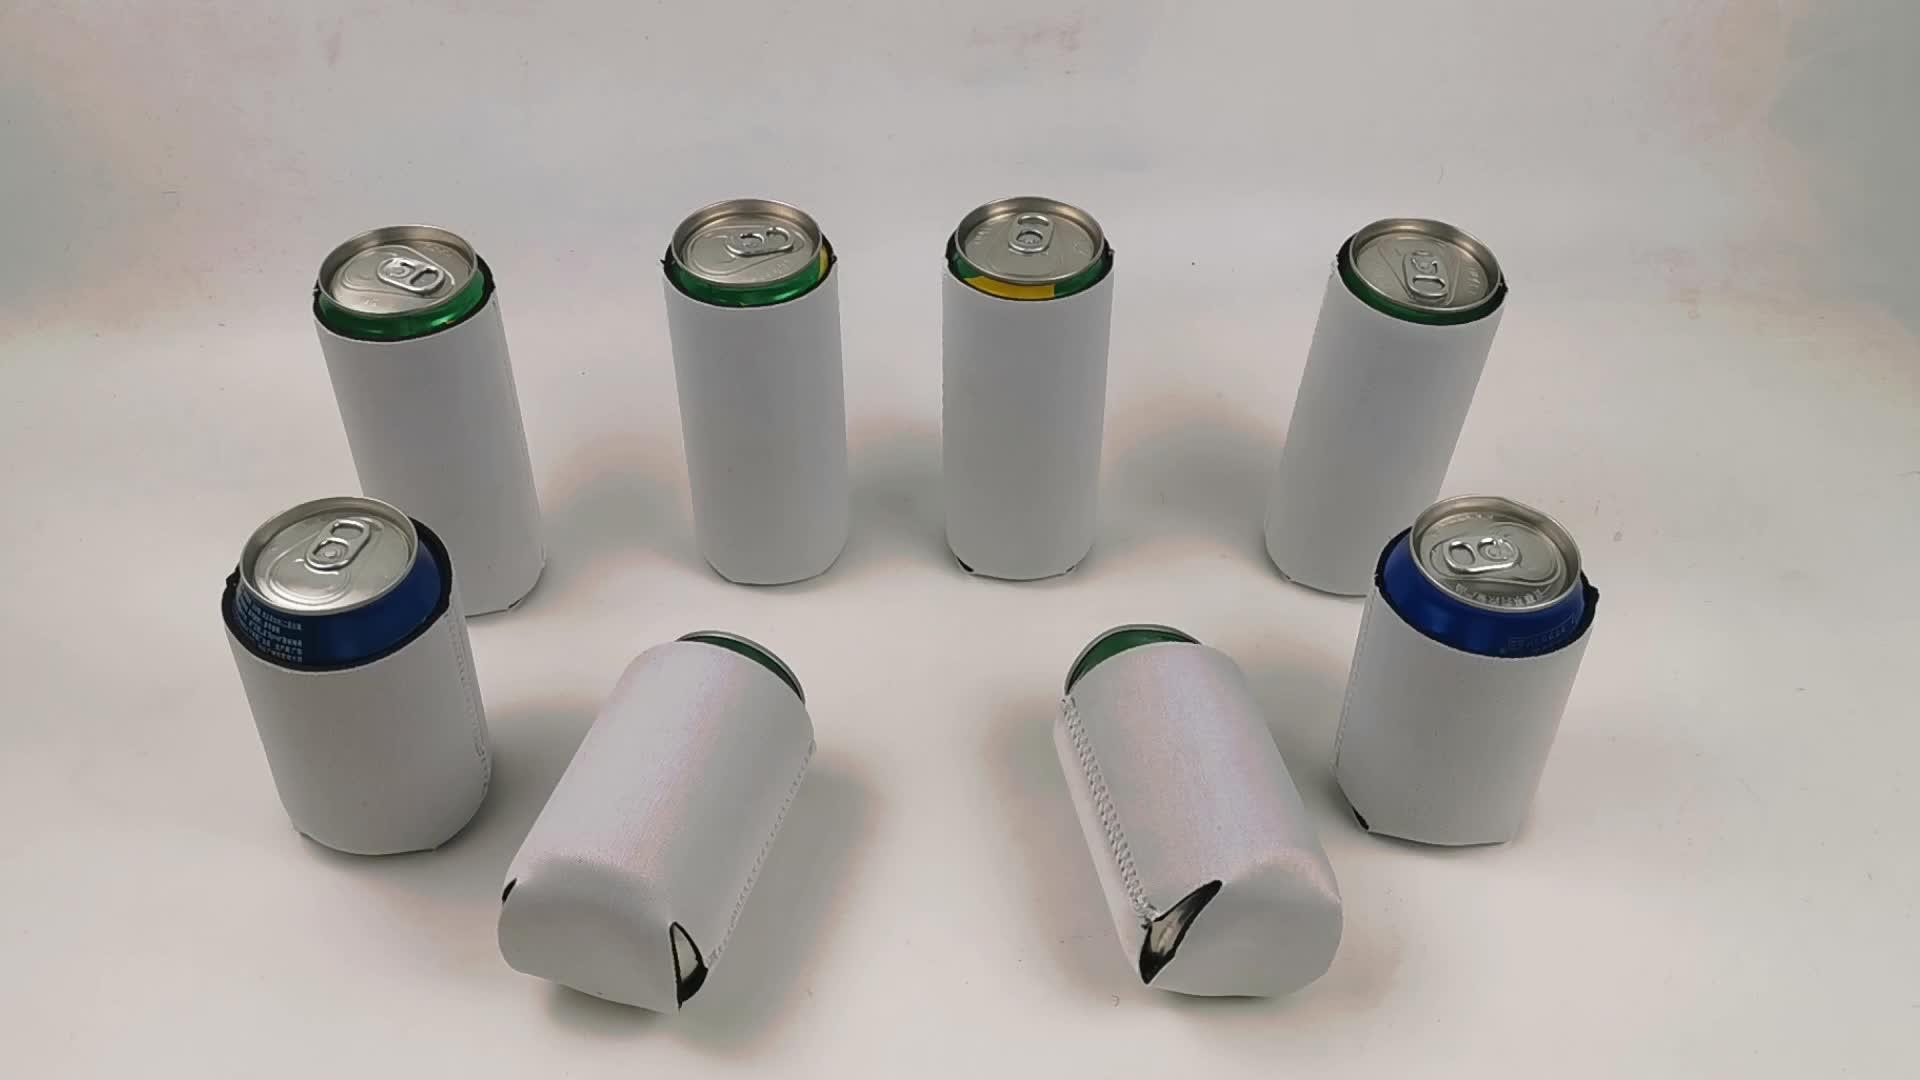 Blank White Foldable 12oz/330ml Can Cooler Neoprene Stubby Holder Insulated Cooler Bag For Sublimation